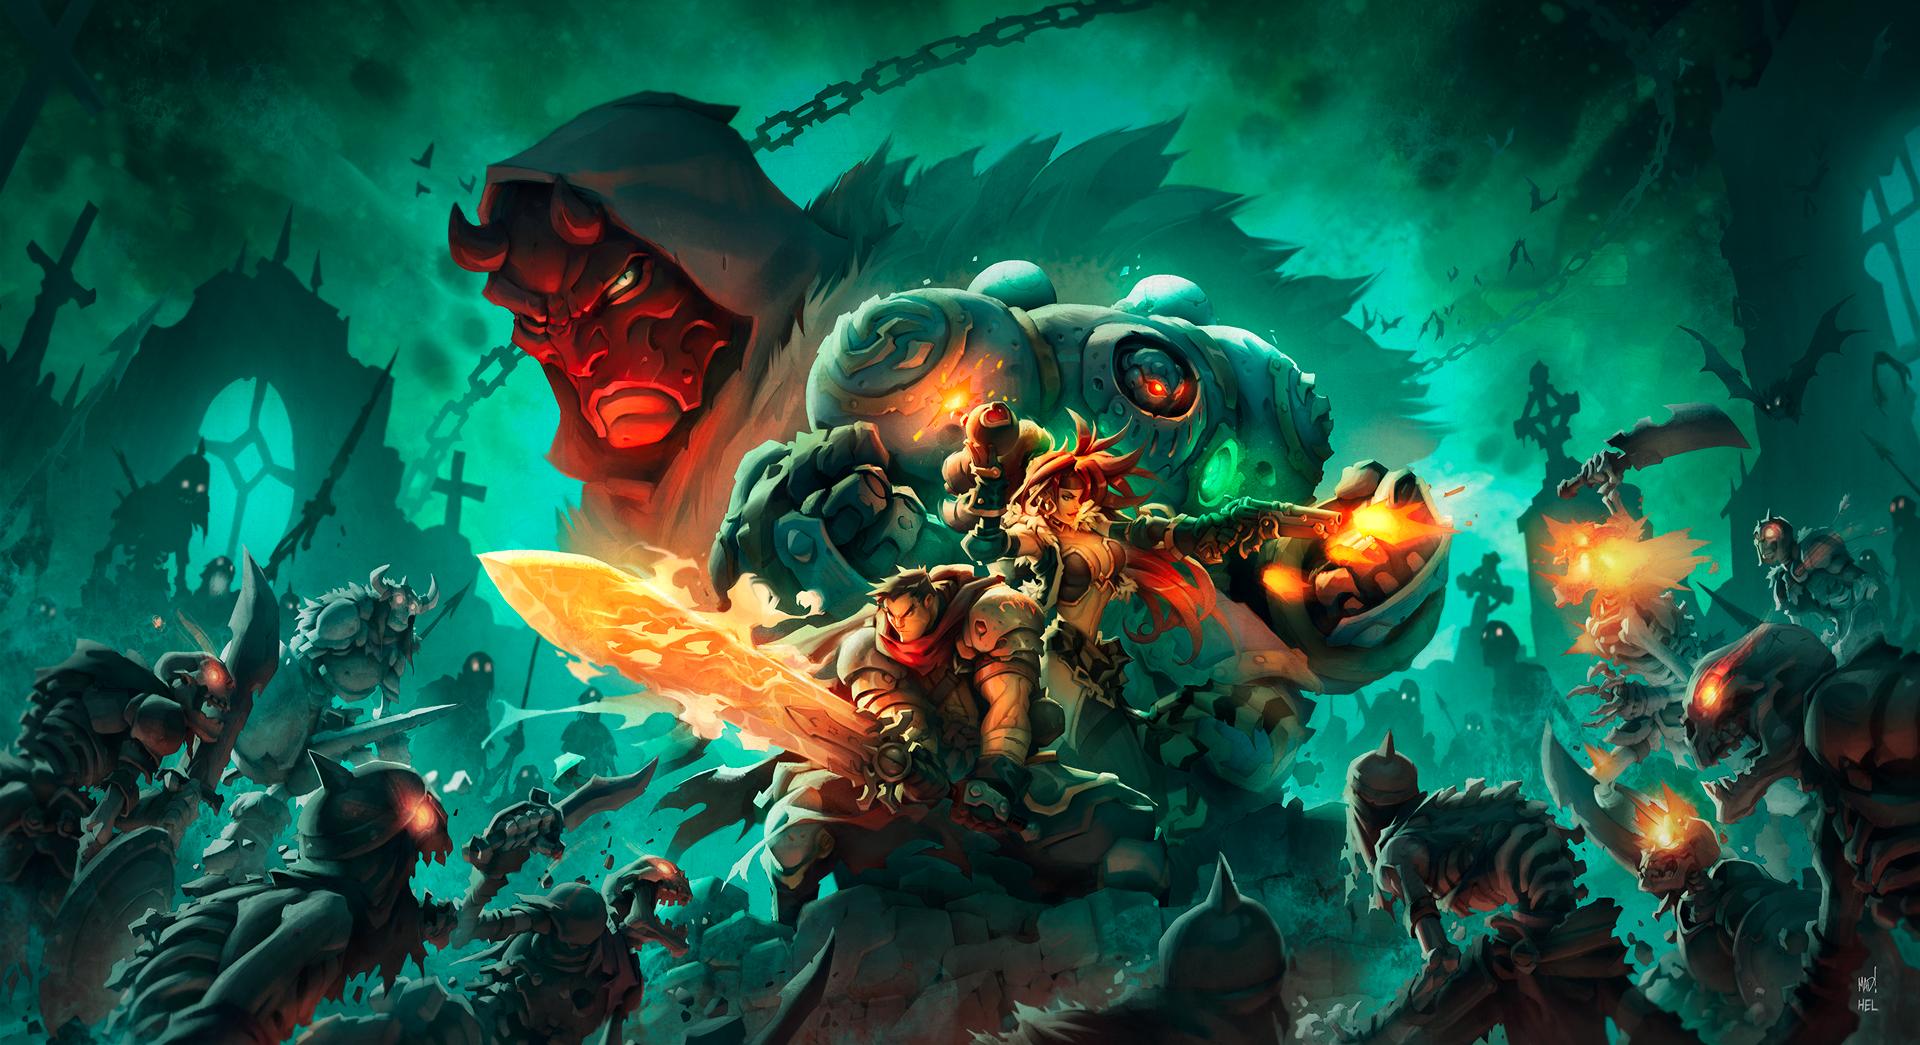 Battle Chasers: Nightwar - Key Art #2 - Variant 2 (Johannes Helgeson)